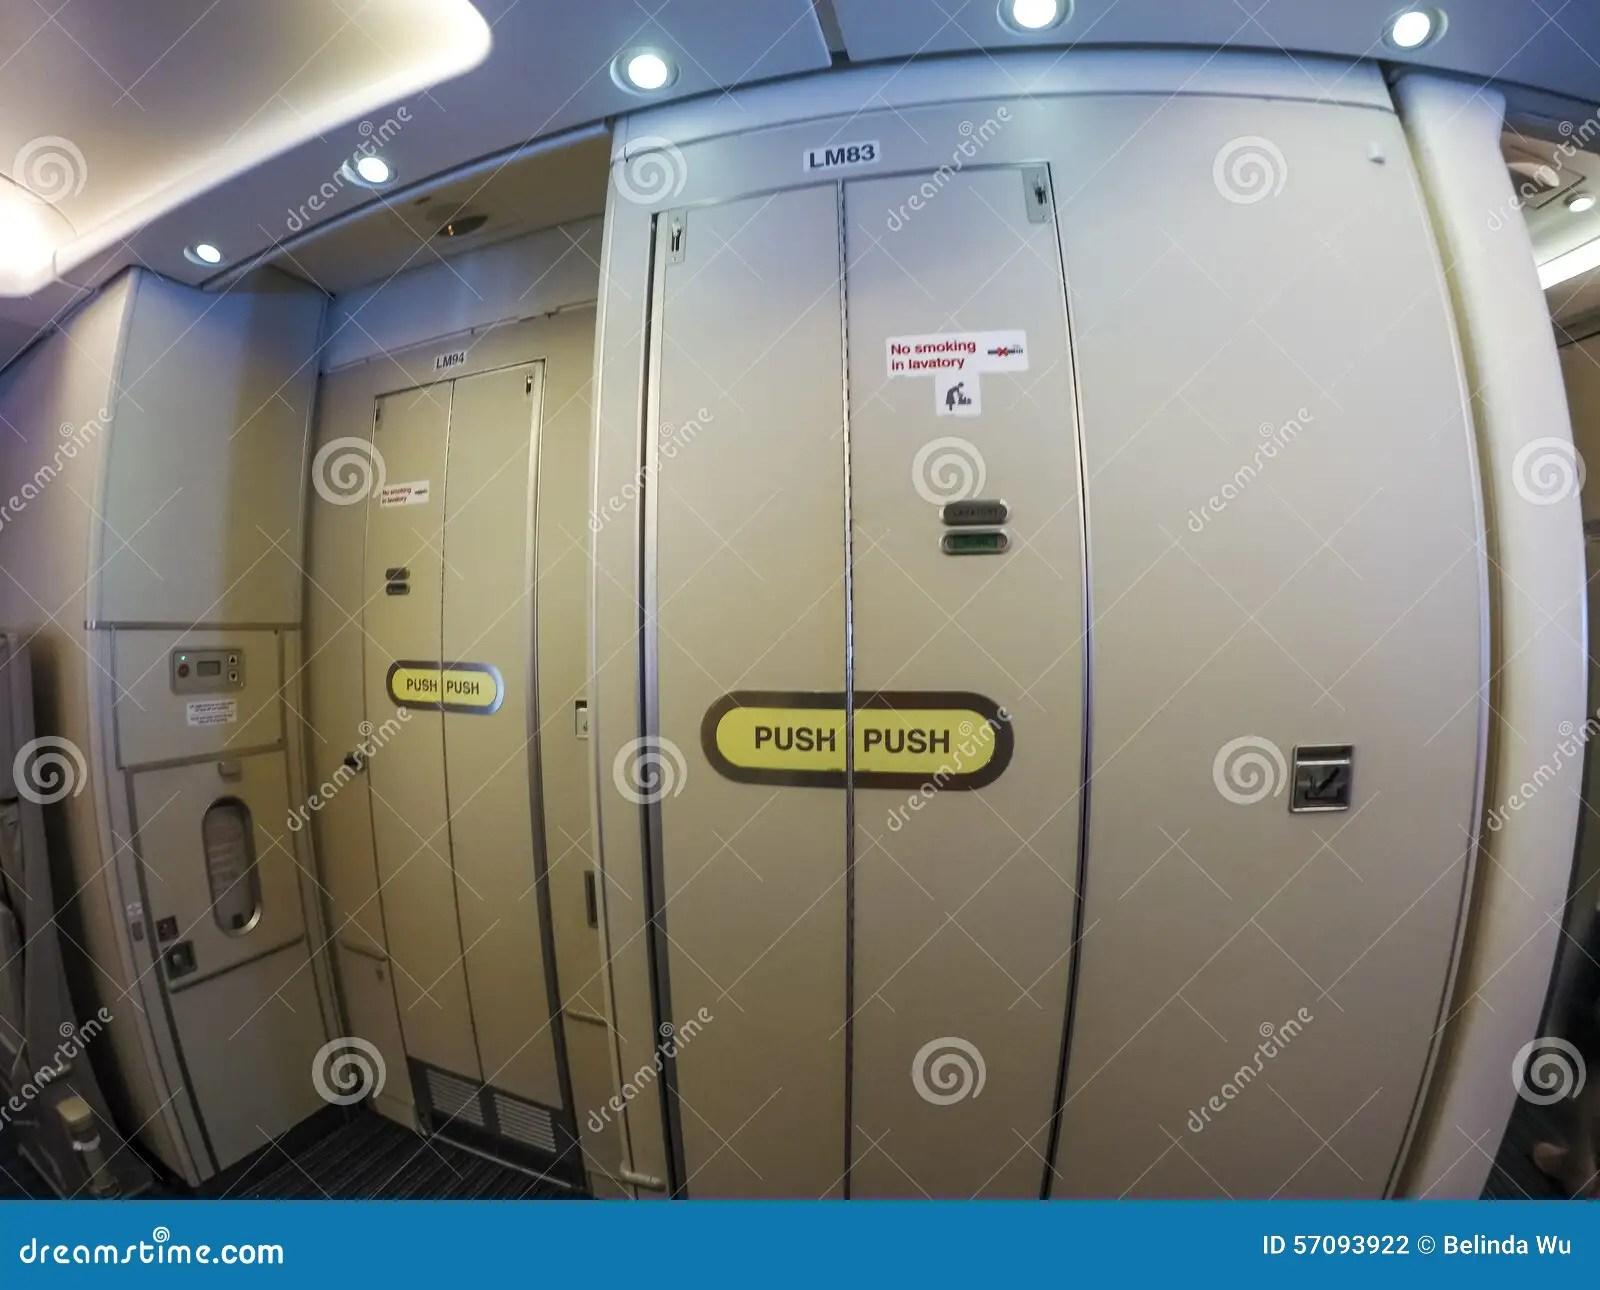 Aircraft lavatory stock photo Image of cabinet locked